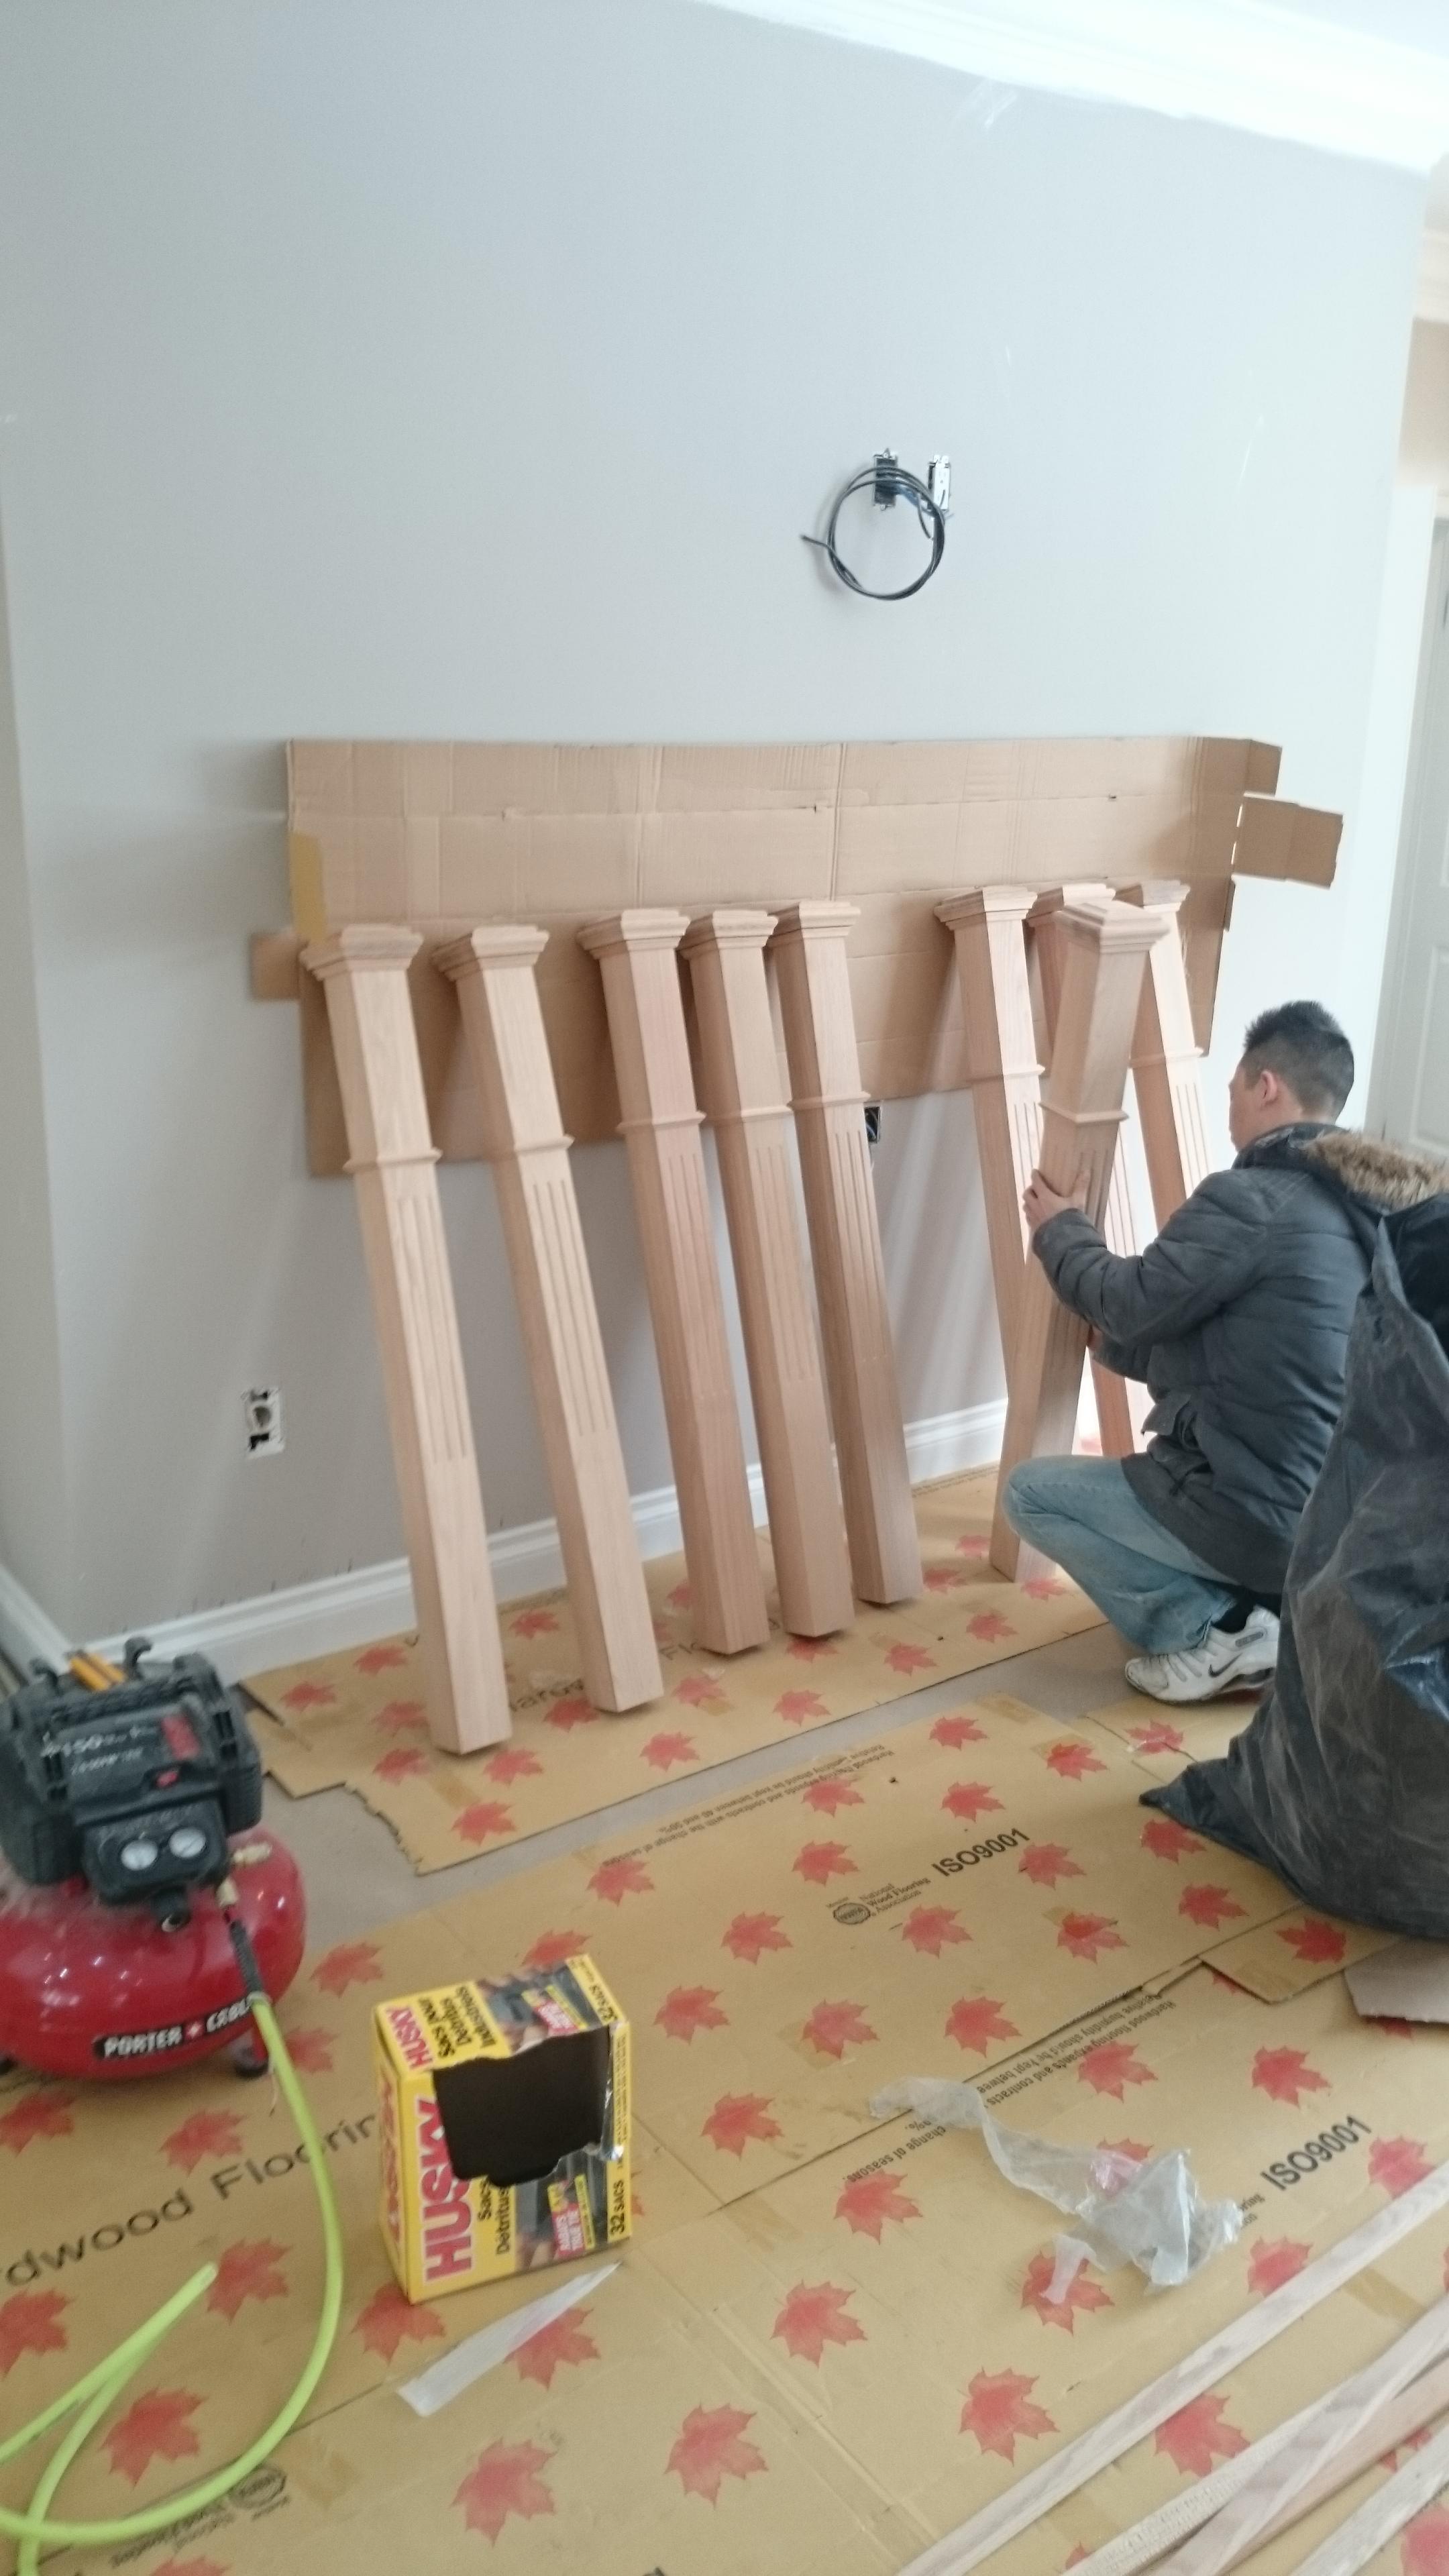 Terry's Hardwood Flooring